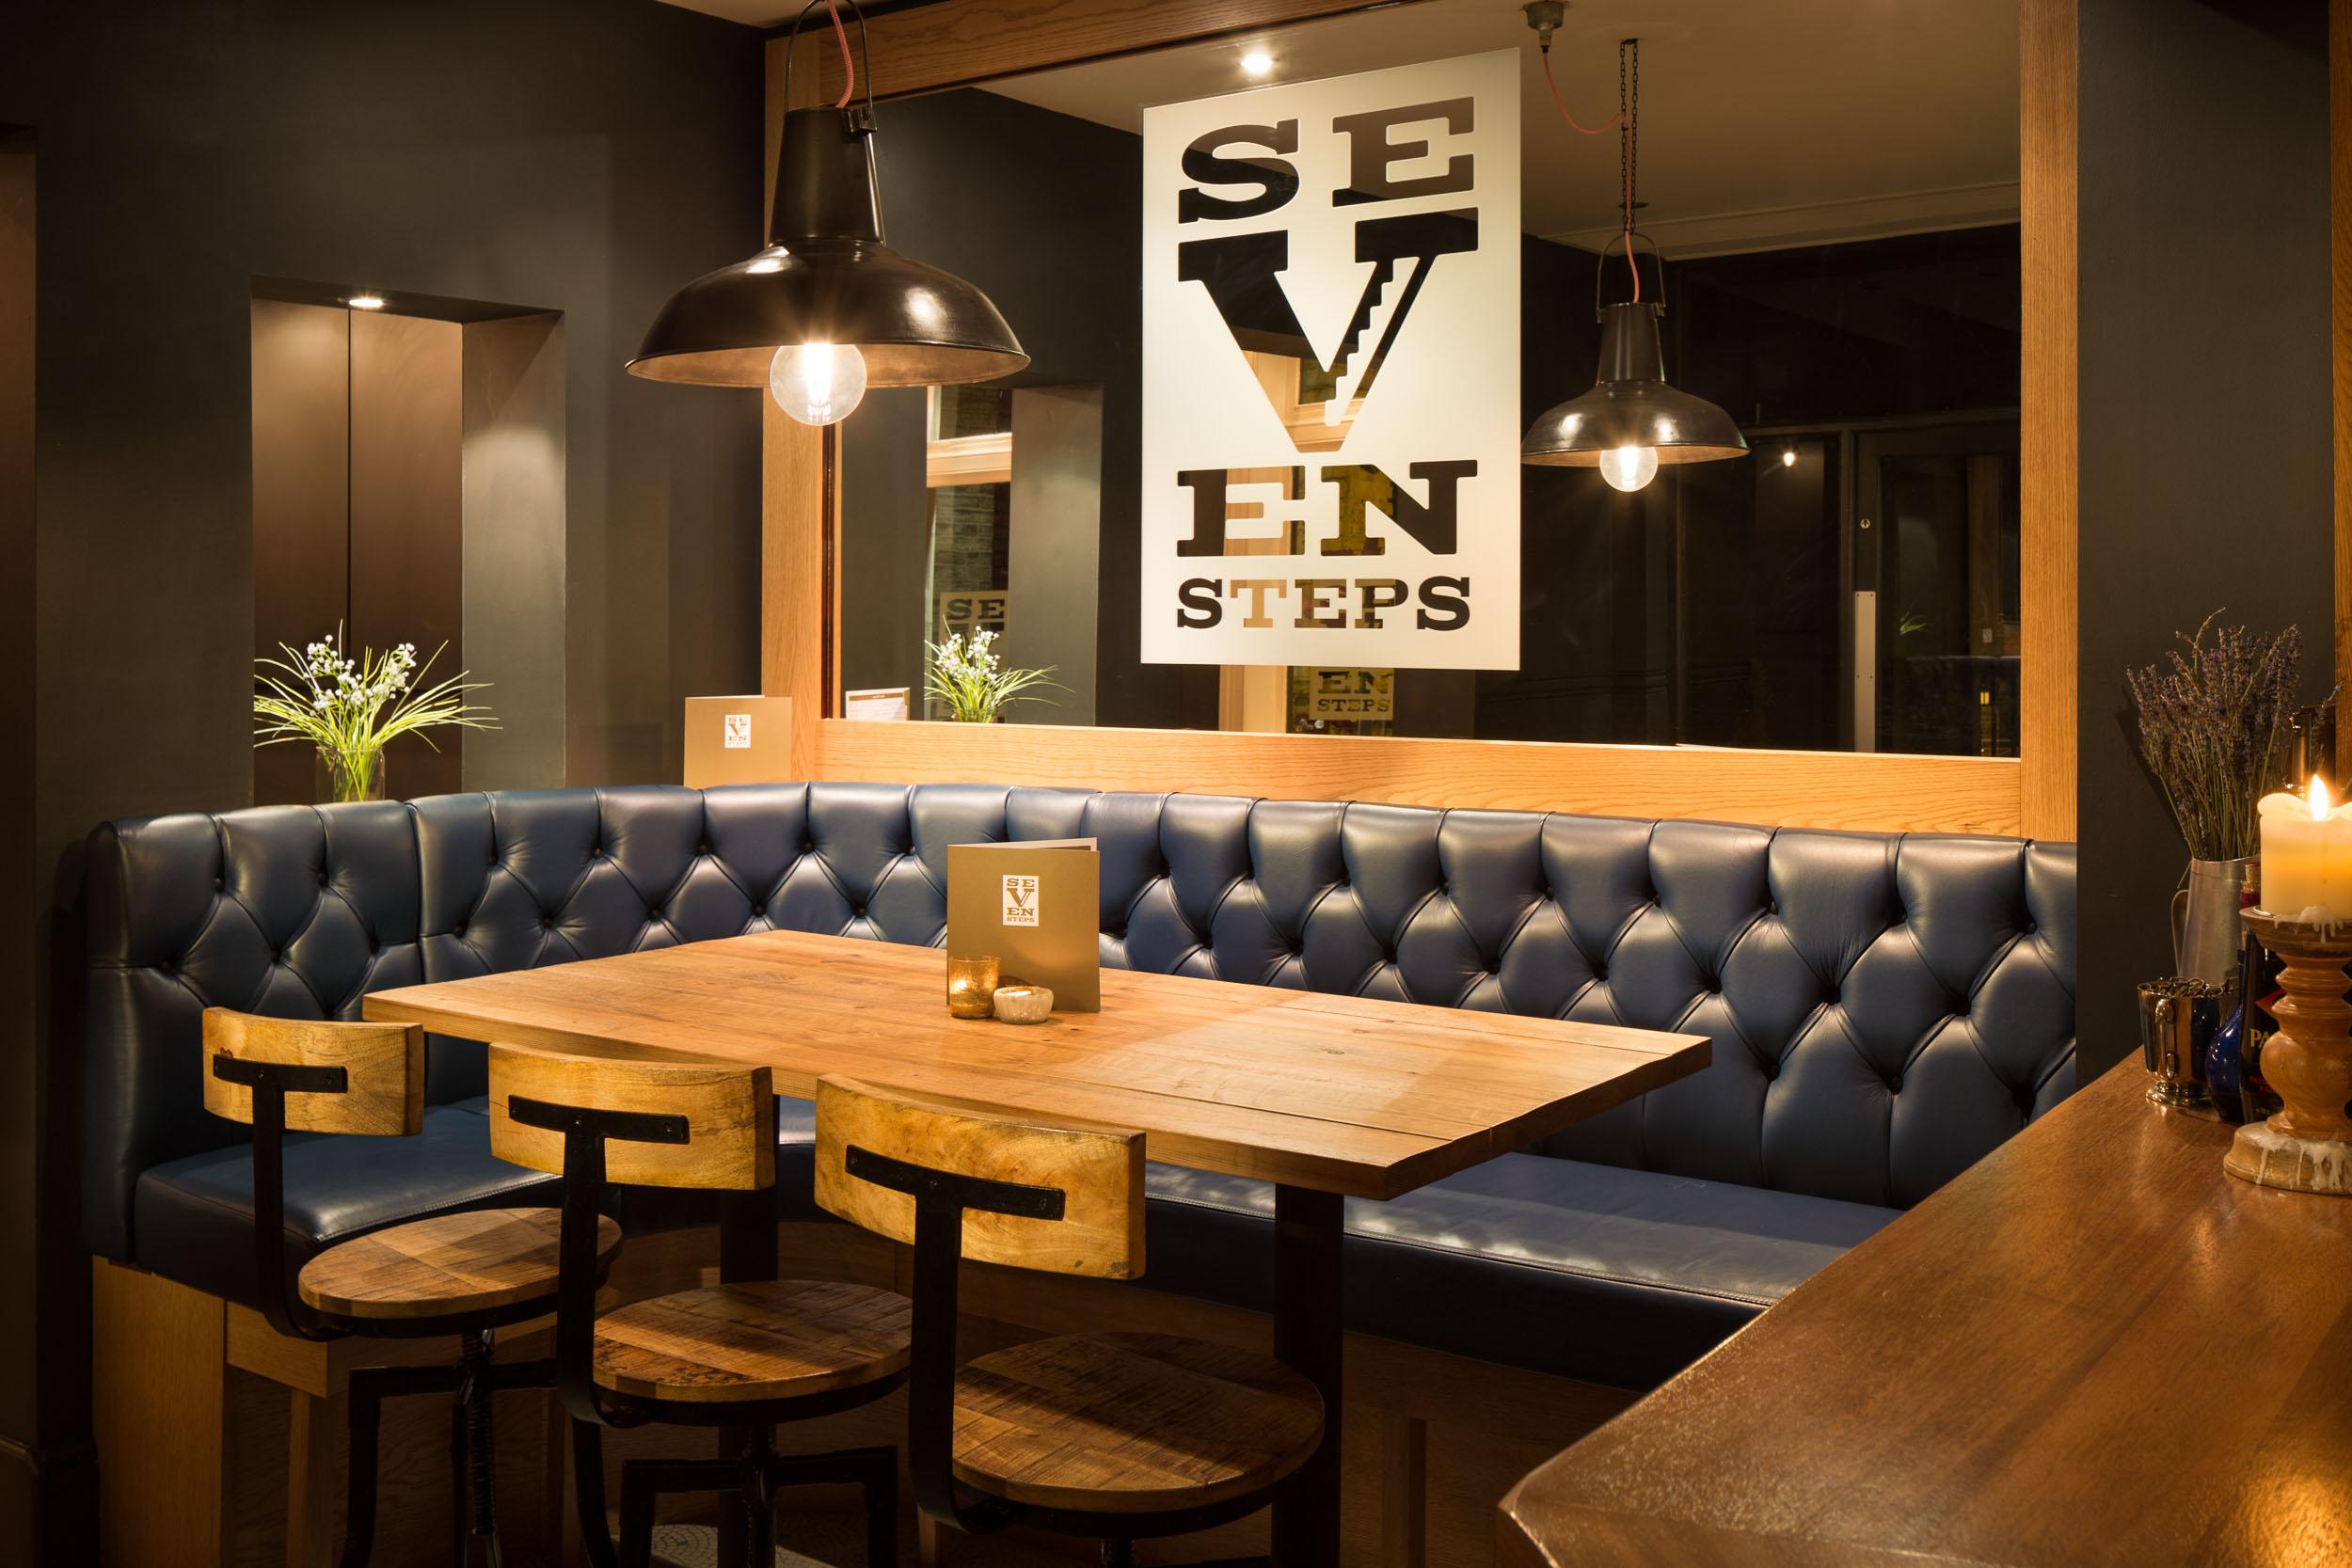 7 steps bar eatery restaurant ambience.jpg